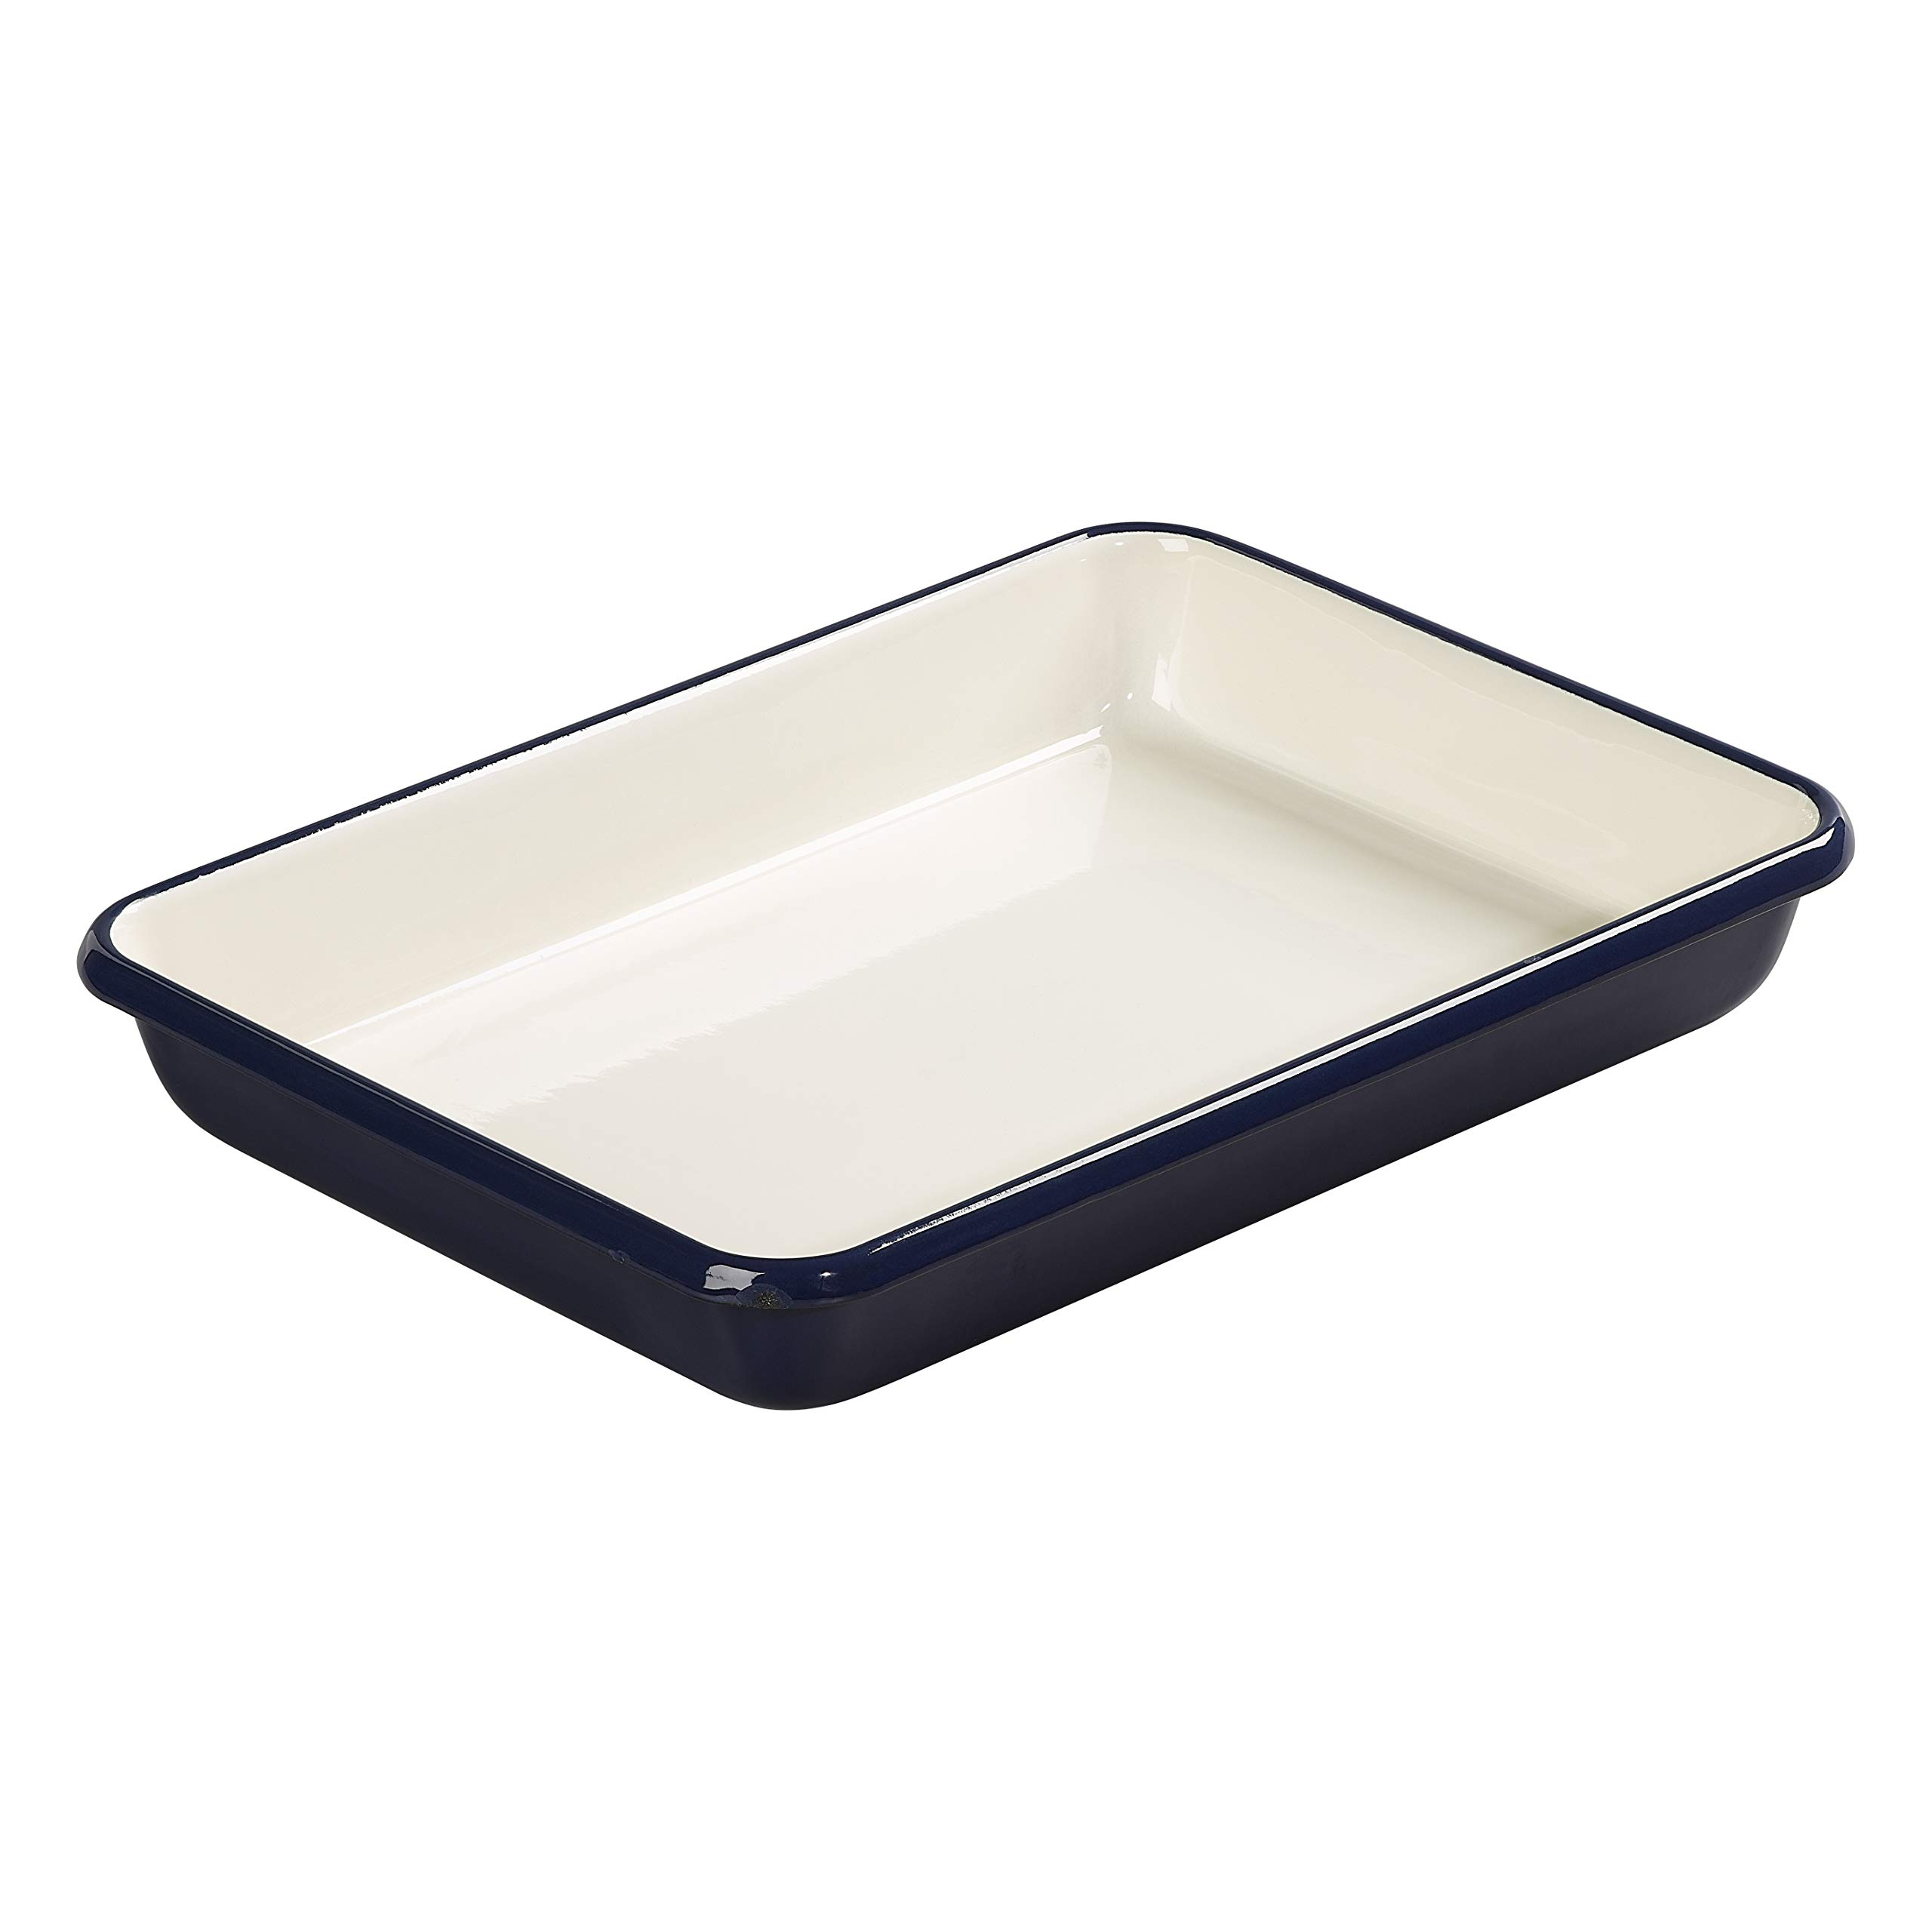 Tala Originals 10B14155 Enamel Bakeware, Indigo & Ivory